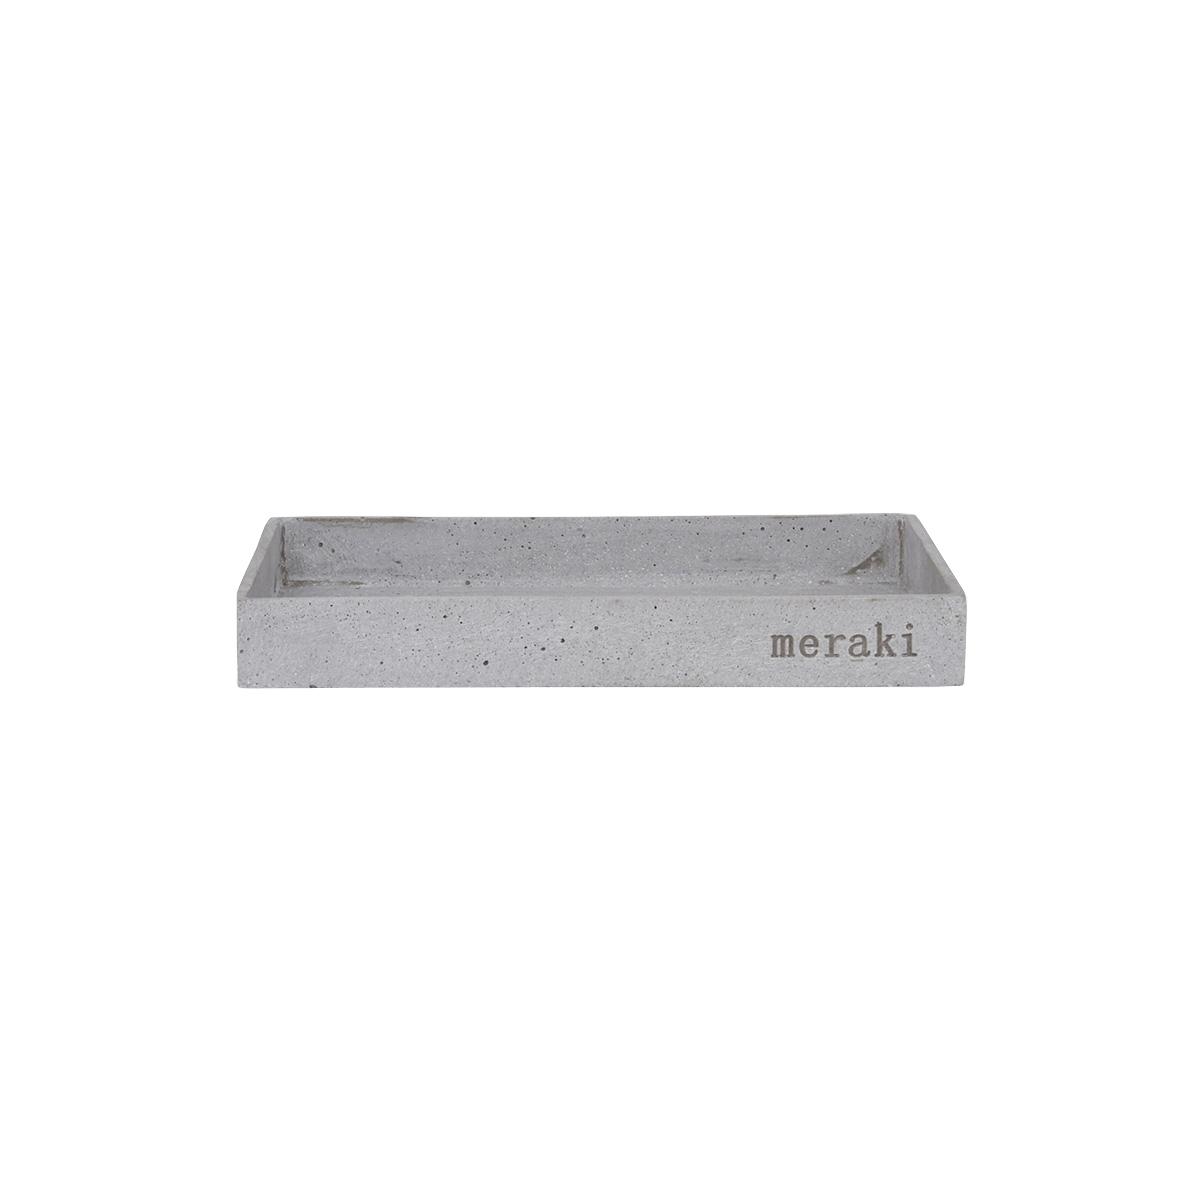 Meraki - Bathroom Tray - Grey (mkda031/307870031)